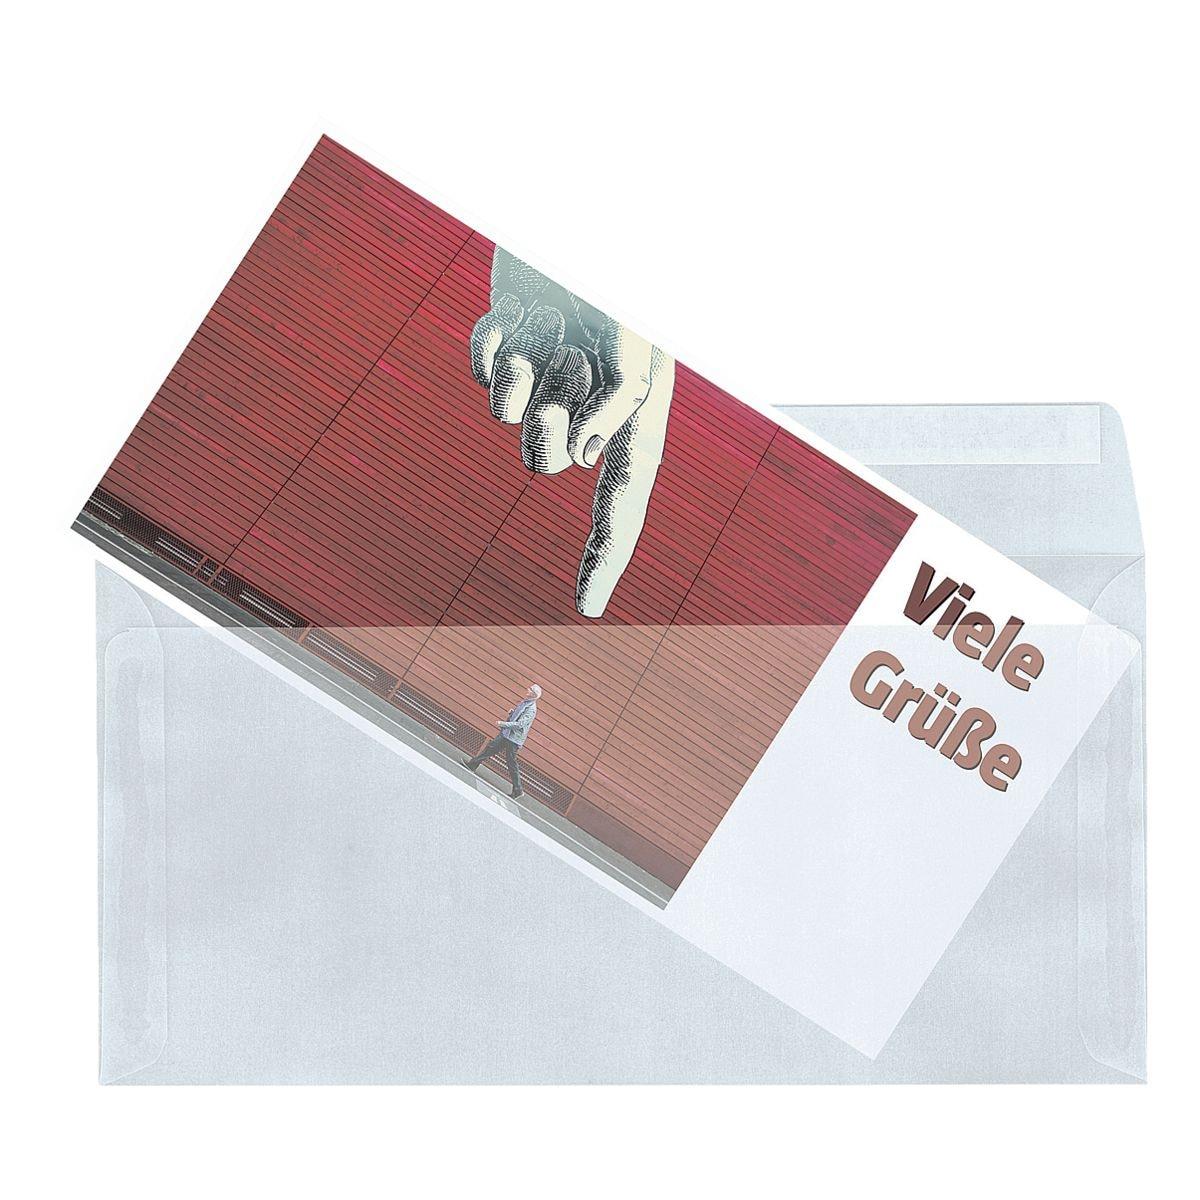 Mailmedia 25 enveloppes transparentes , DL+ 82 g/m² sans fenêtre